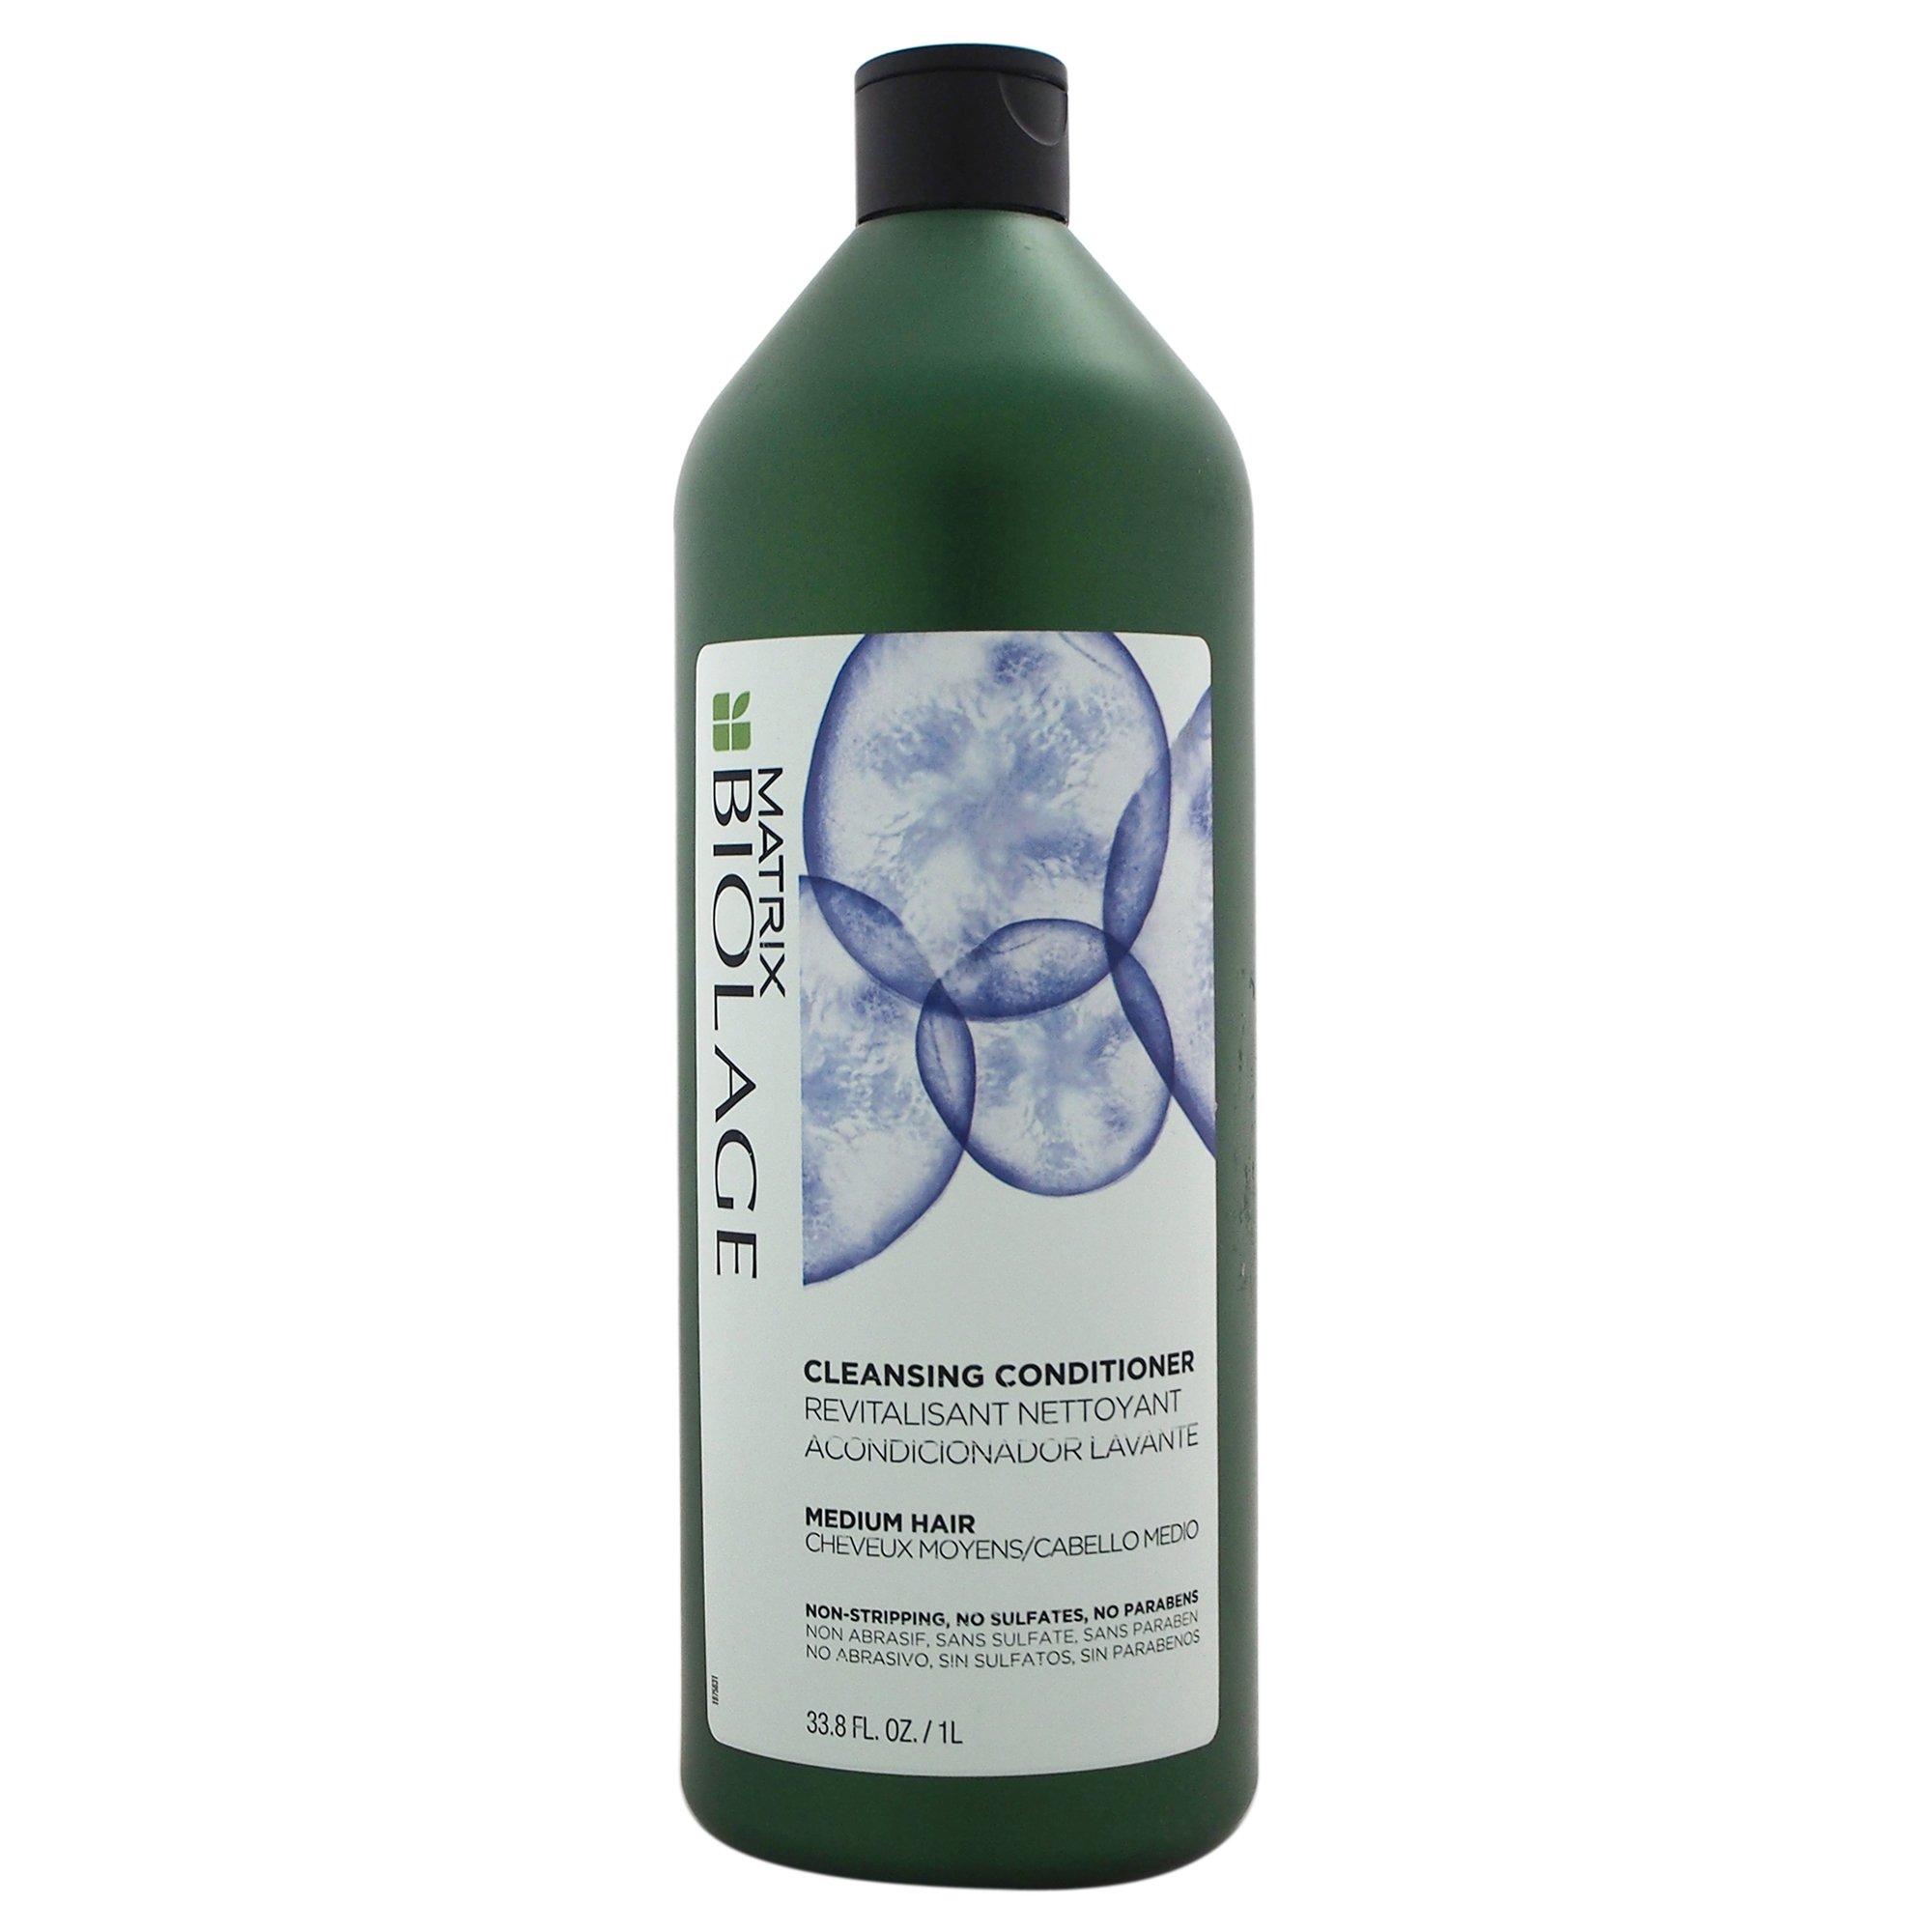 Matrix hair brush 4 - Matrix Biolage Cleansing Conditioner For Medium Hair 33 8 Ounce